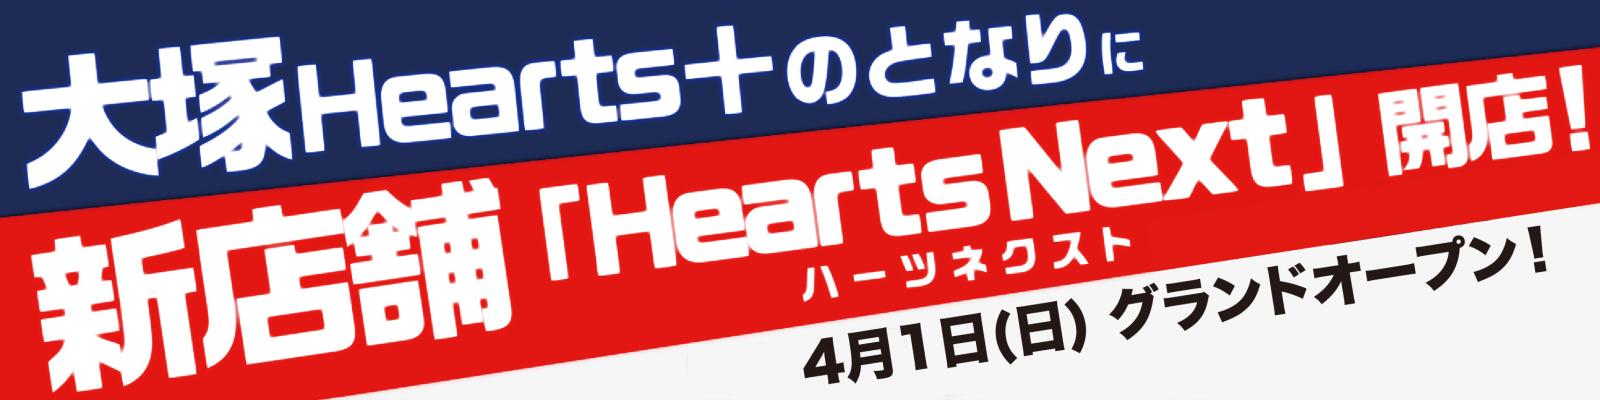 大塚Hearts+